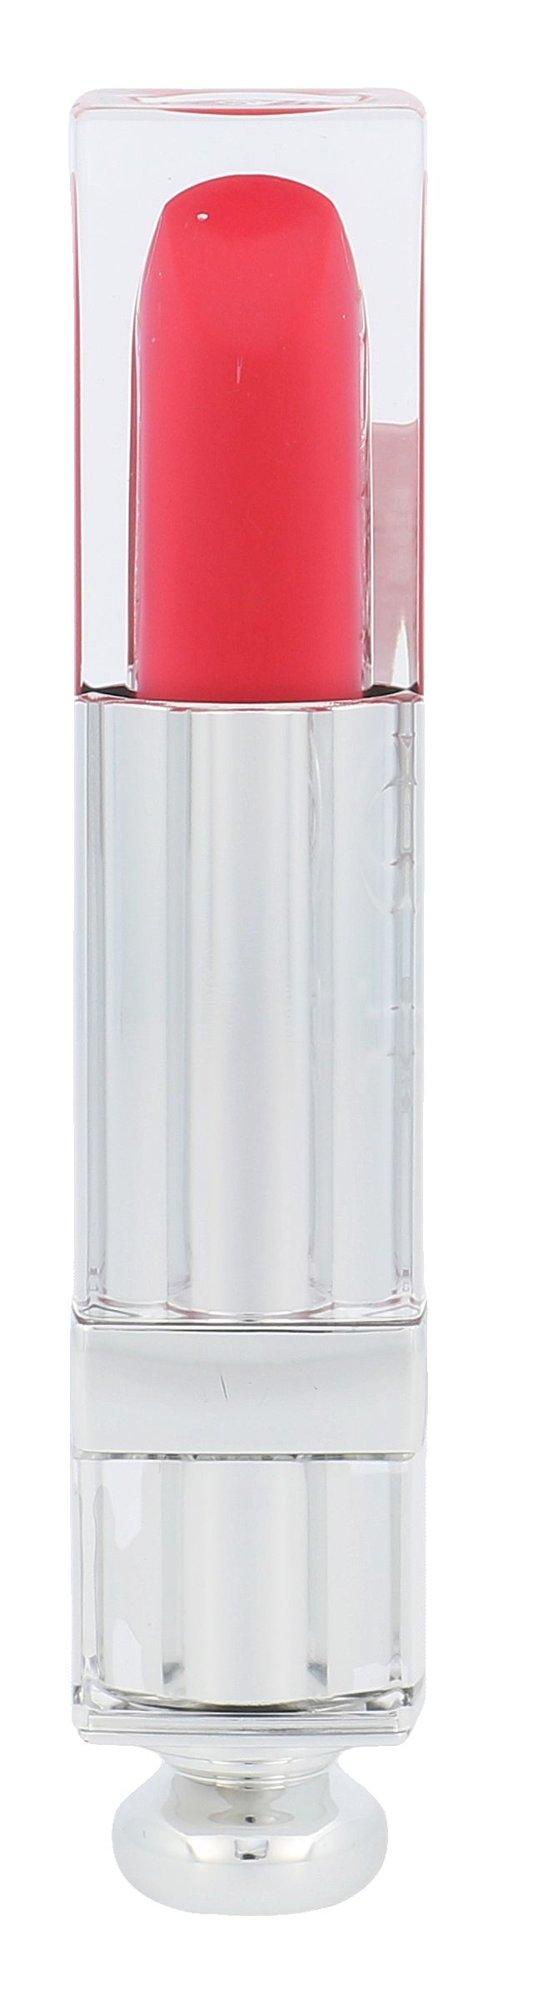 Christian Dior Addict Cosmetic 5,5ml 575 Wonderland